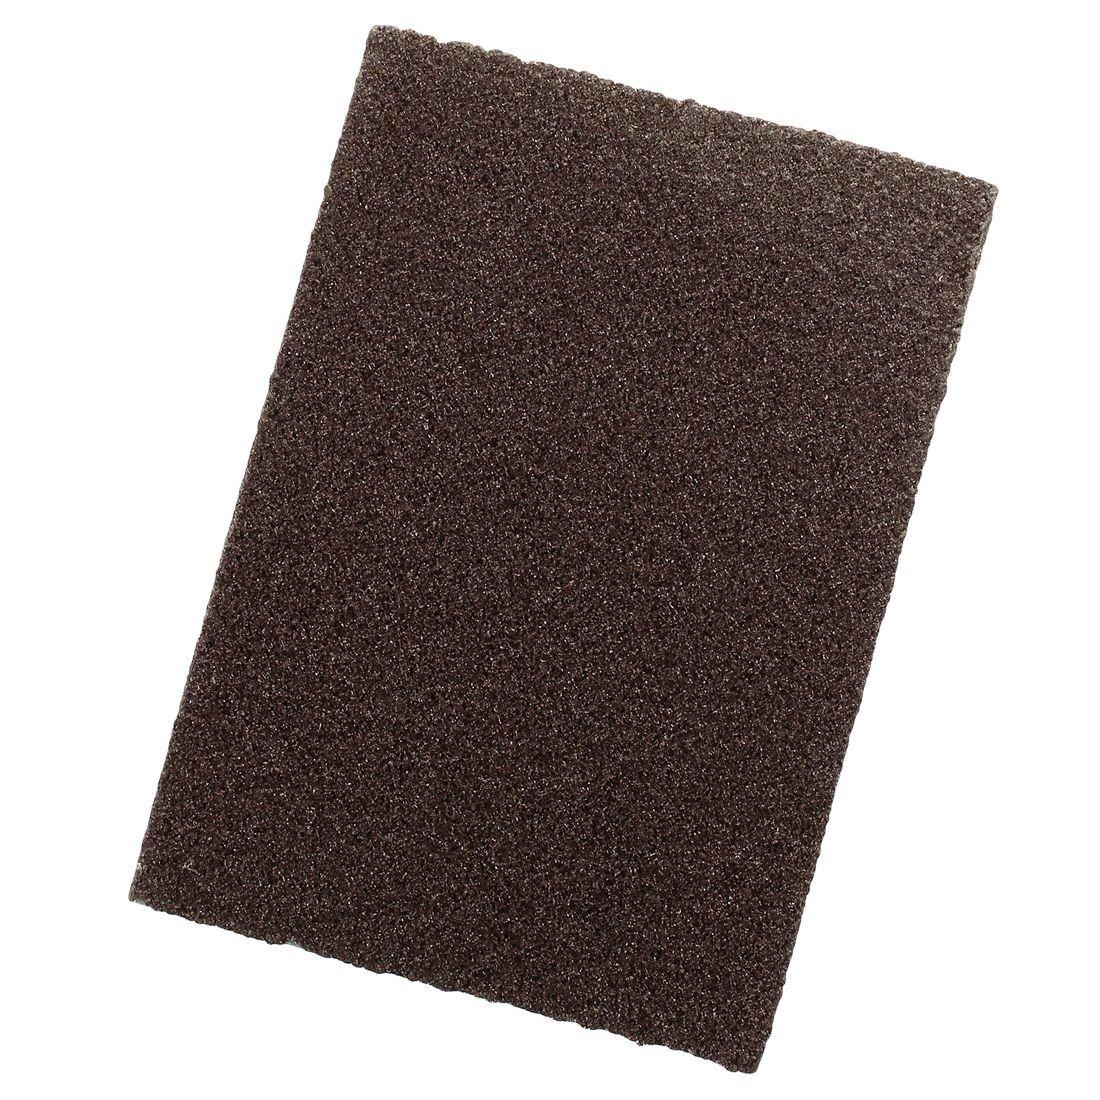 XZANTE Esponja de Lijado Cepillo magico Limpio desincrustante Flexible Fino de carborundo de Area Grande Granate